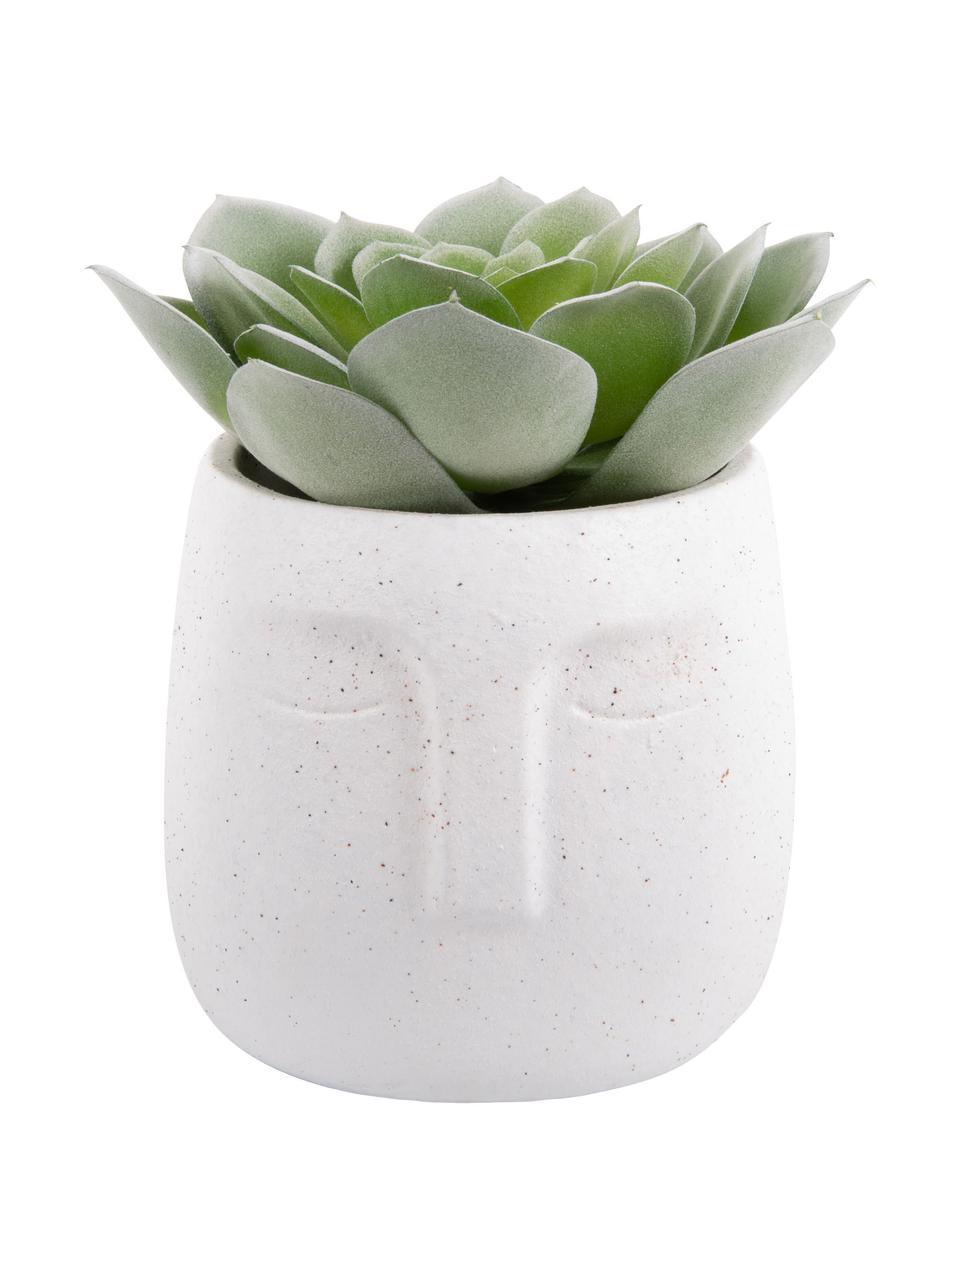 Portavaso viso in cemento Face, Cemento, Bianco, Ø 13 x Alt. 14 cm